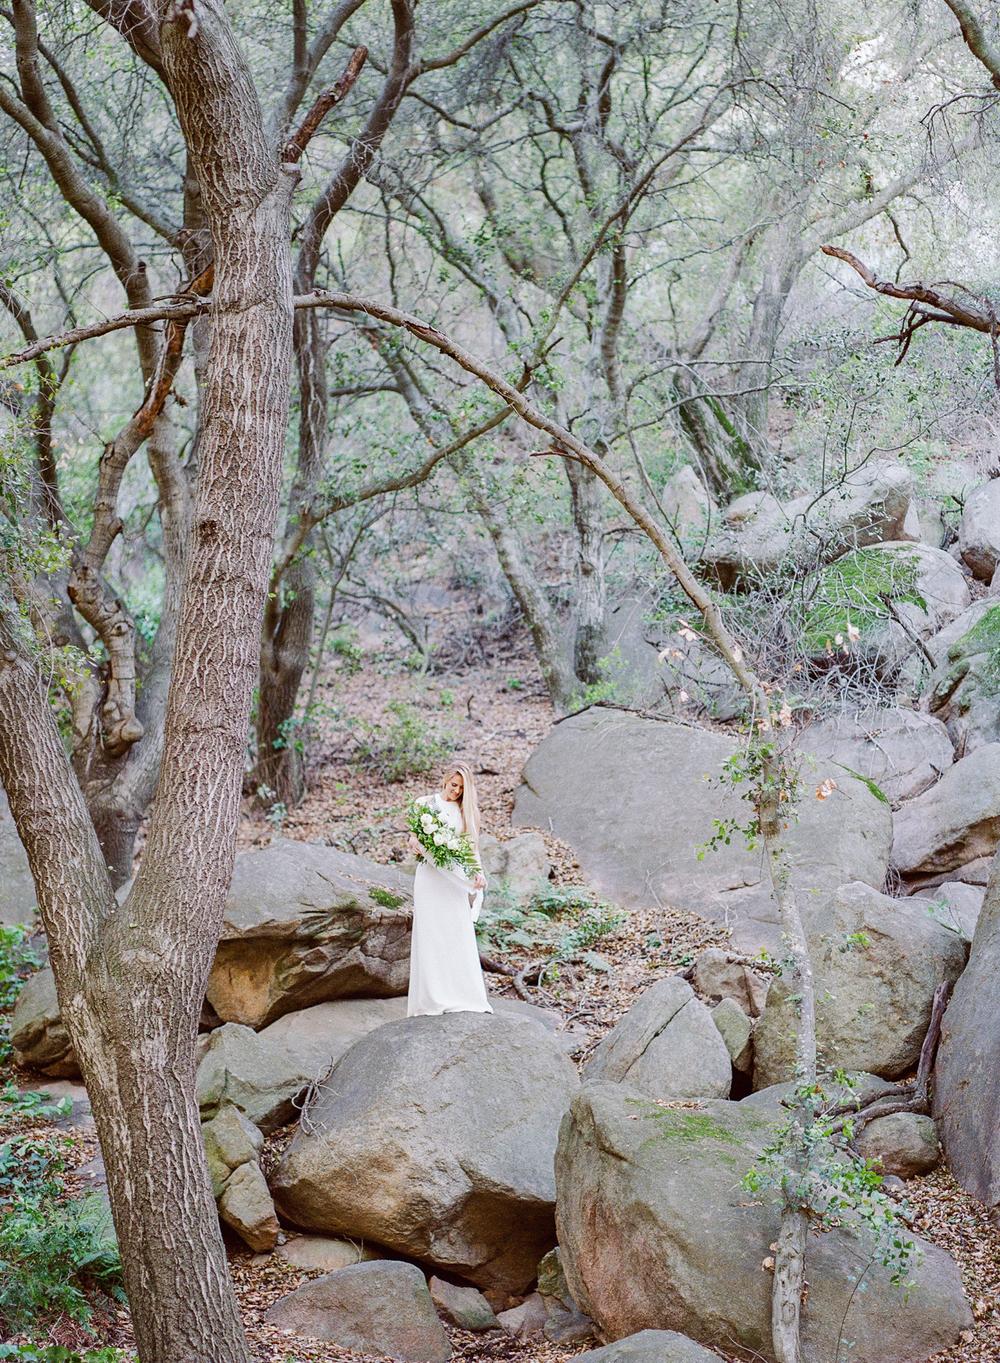 006-Jen-Wojcik-Photography-San-Diego-Photographer.jpg